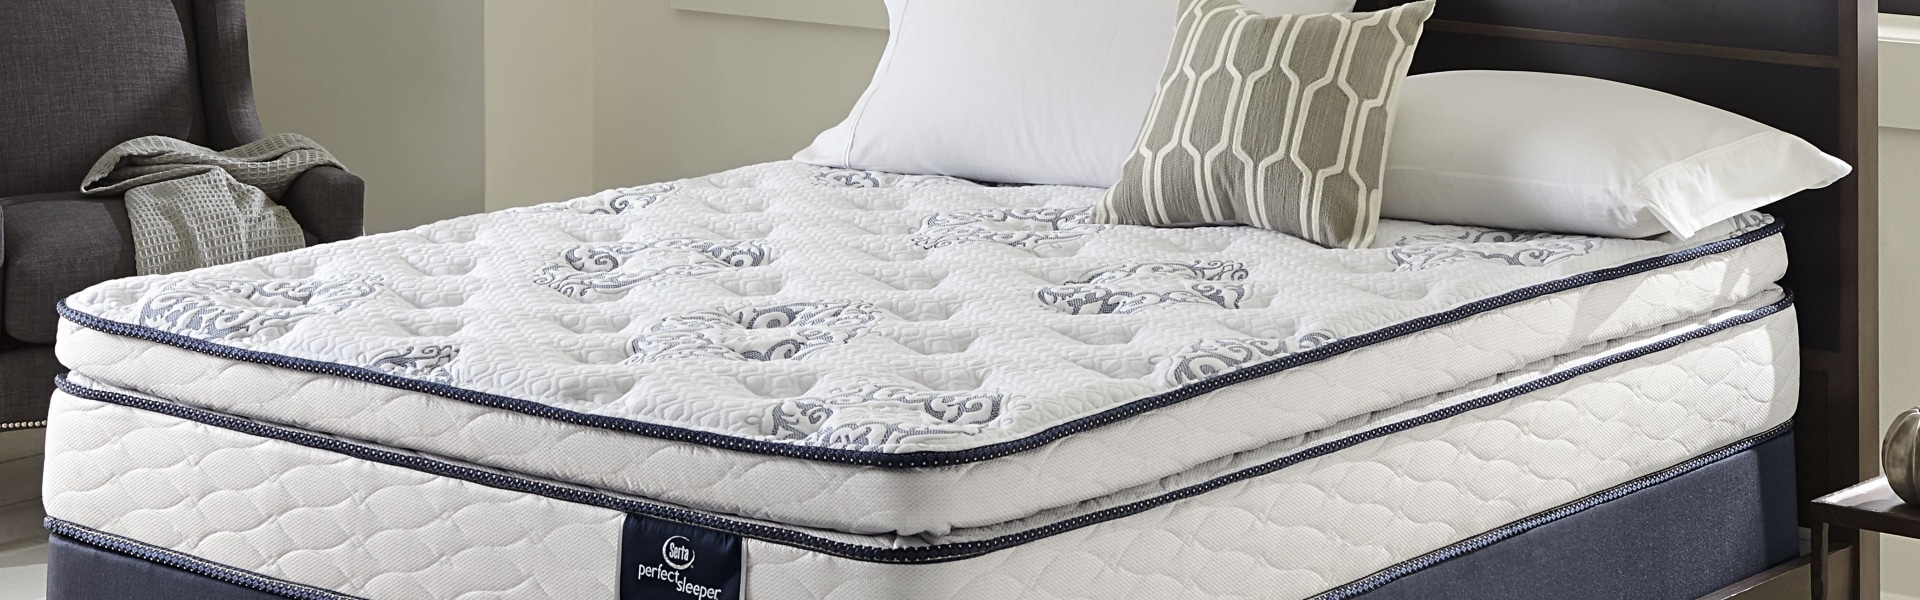 Best Pillow Top Mattresses Reviewed in Detail